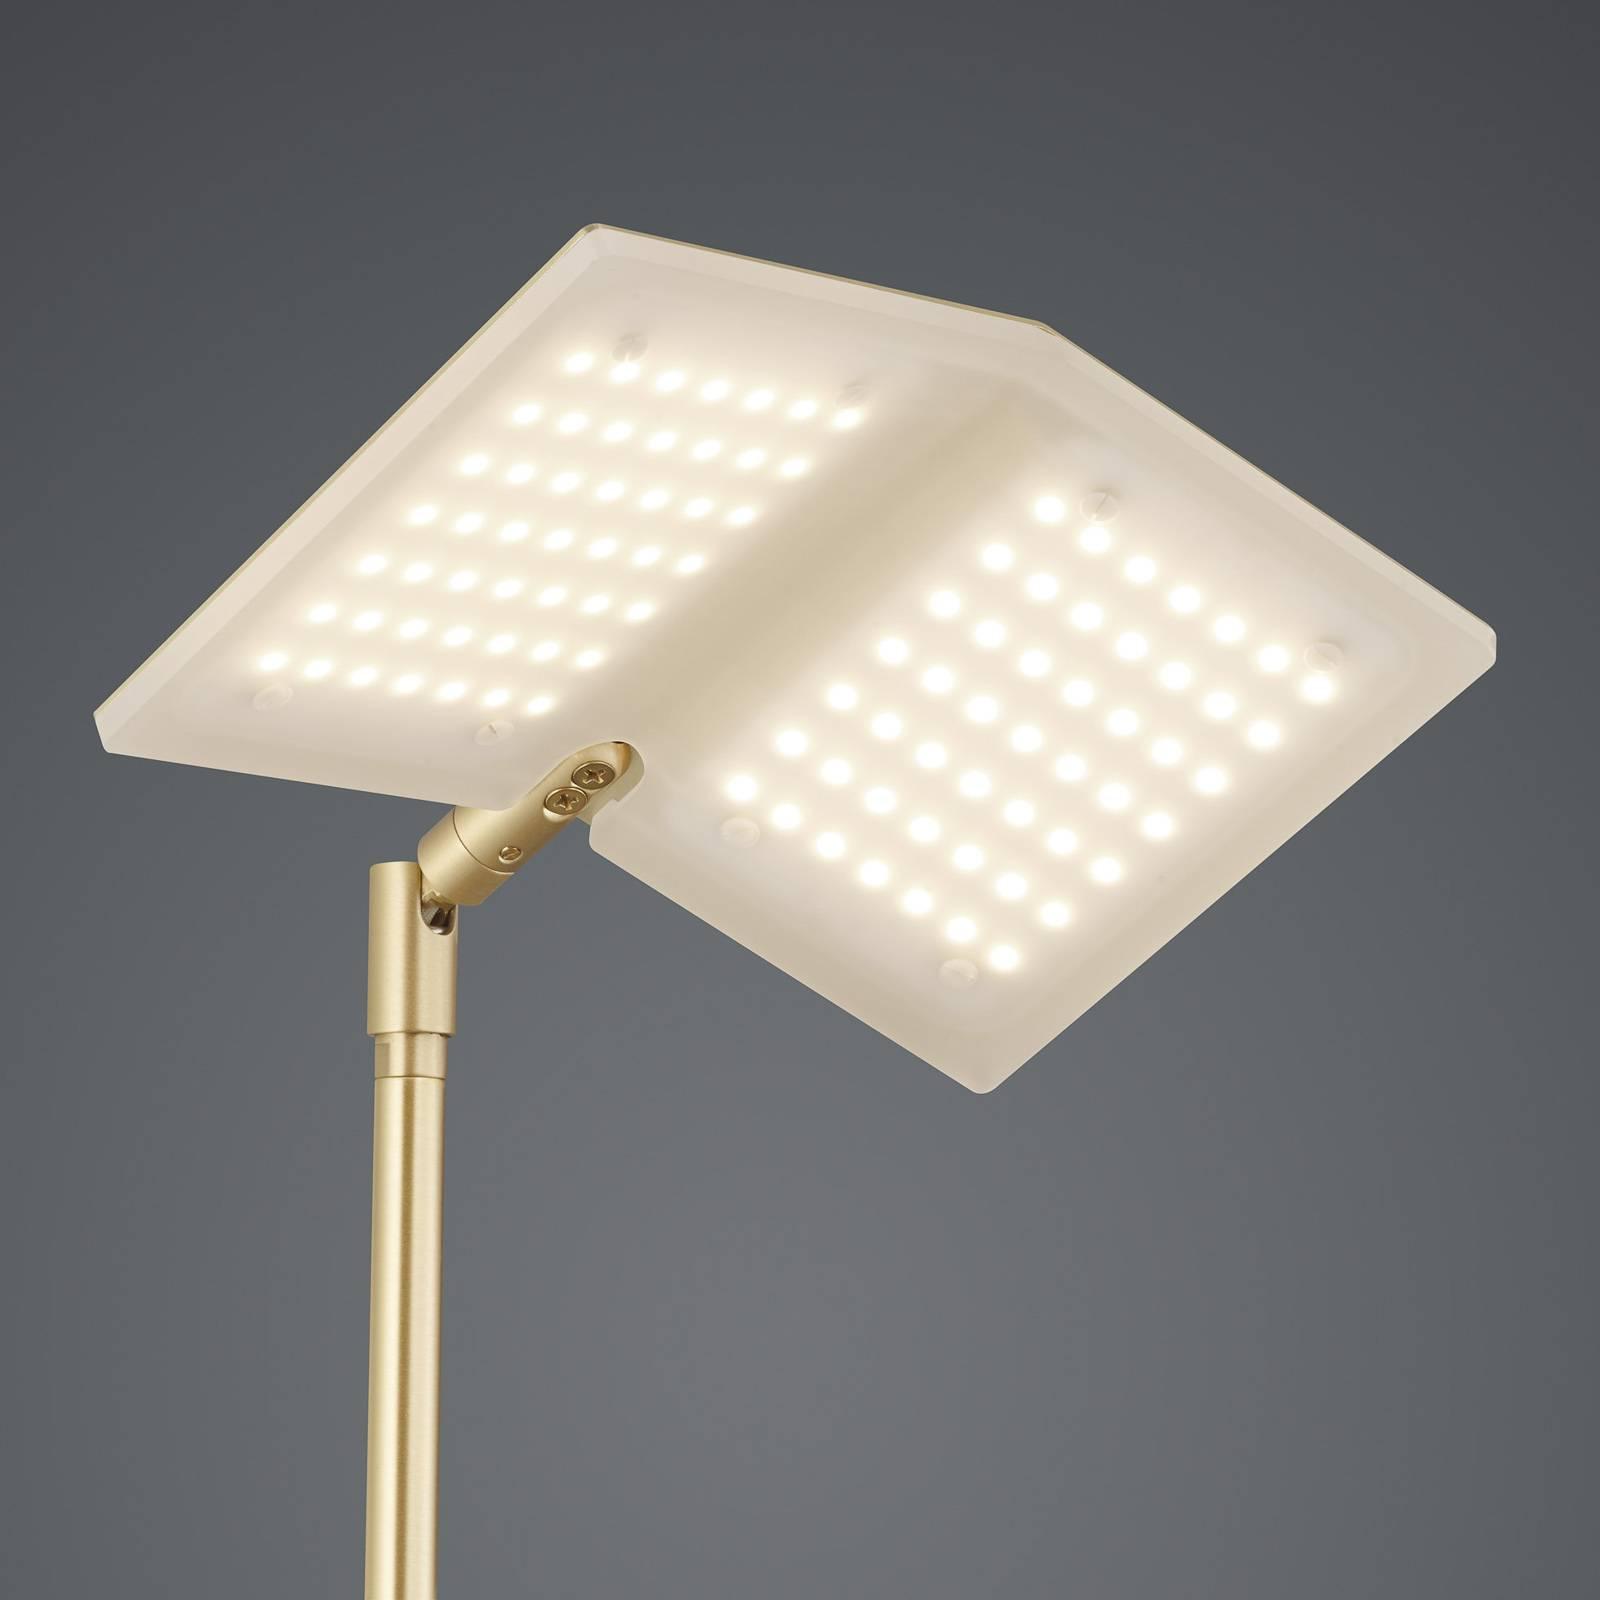 BANKAMP Book LED-lattiavalaisin messinki